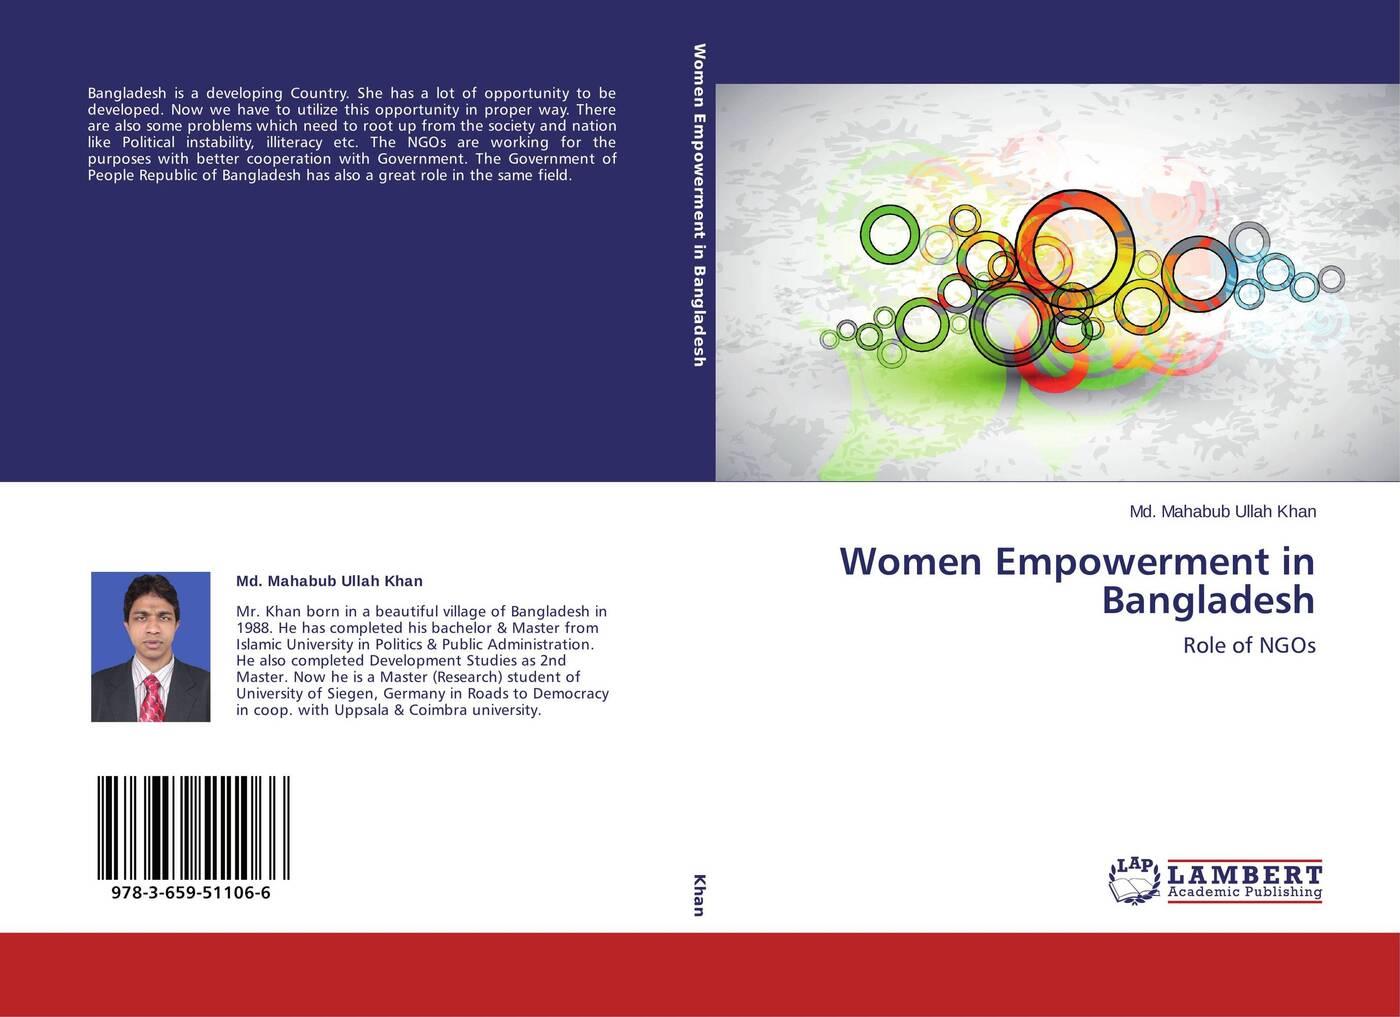 Md. Mahabub Ullah Khan Women Empowerment in Bangladesh aging problems of indigenous people of bangladesh